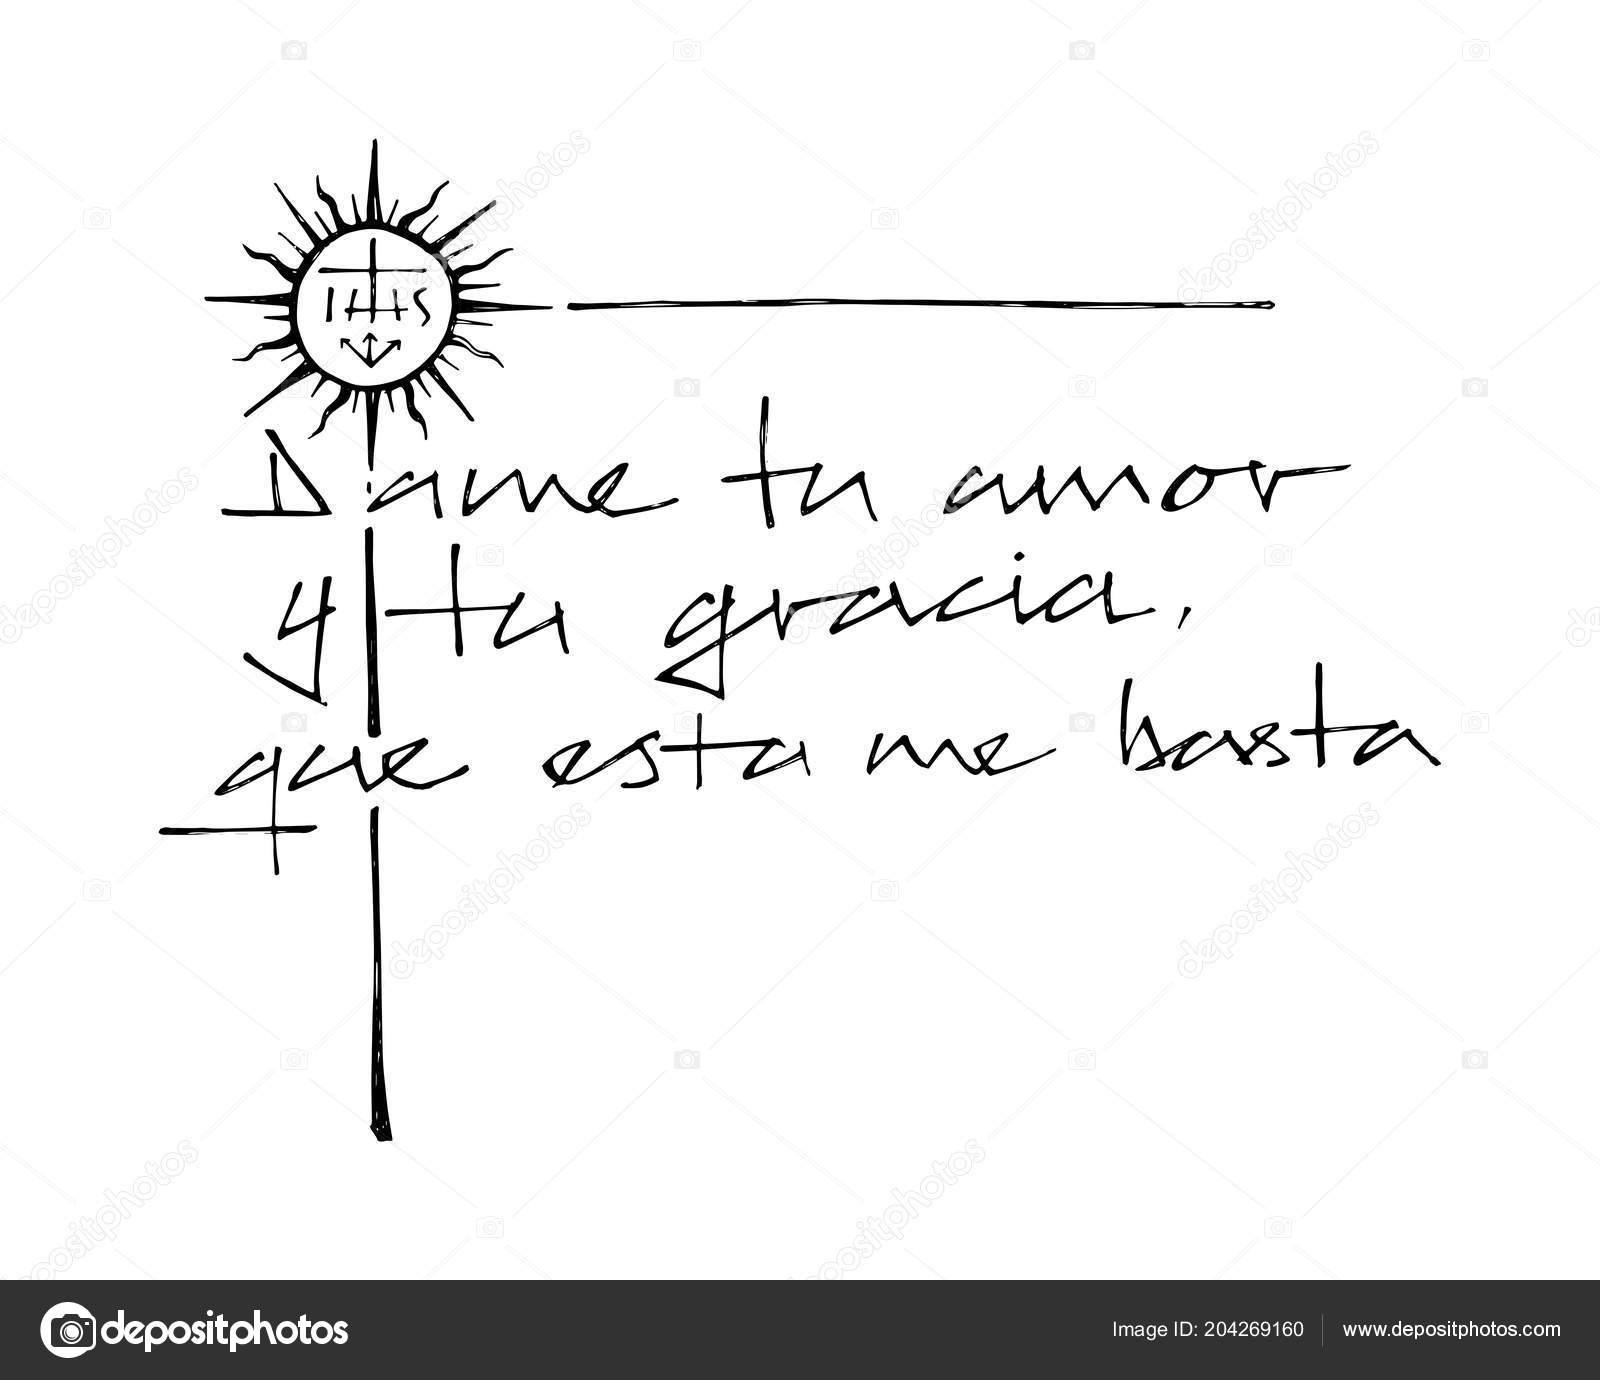 Dibujo Frase Christian Jesuita Espanol Que Significa Dame Amor